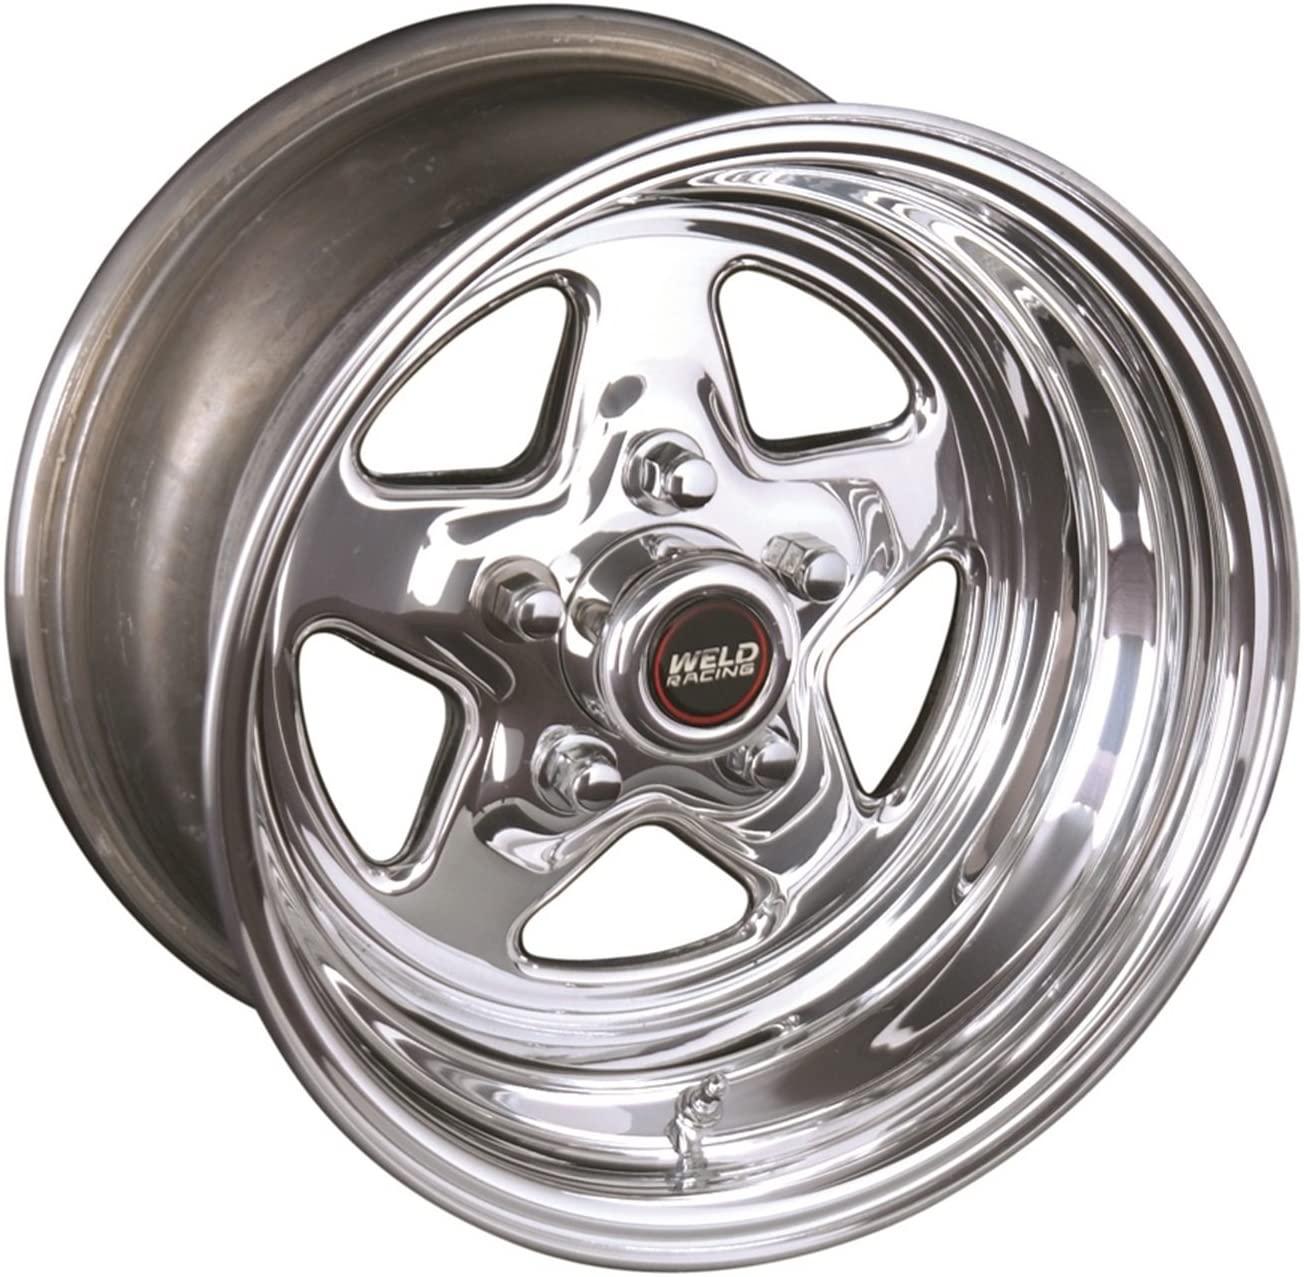 Weld ProStar 15x4 / 5x4.75 BP / 2.5in. BS Polished Wheel - Non-Beadlock